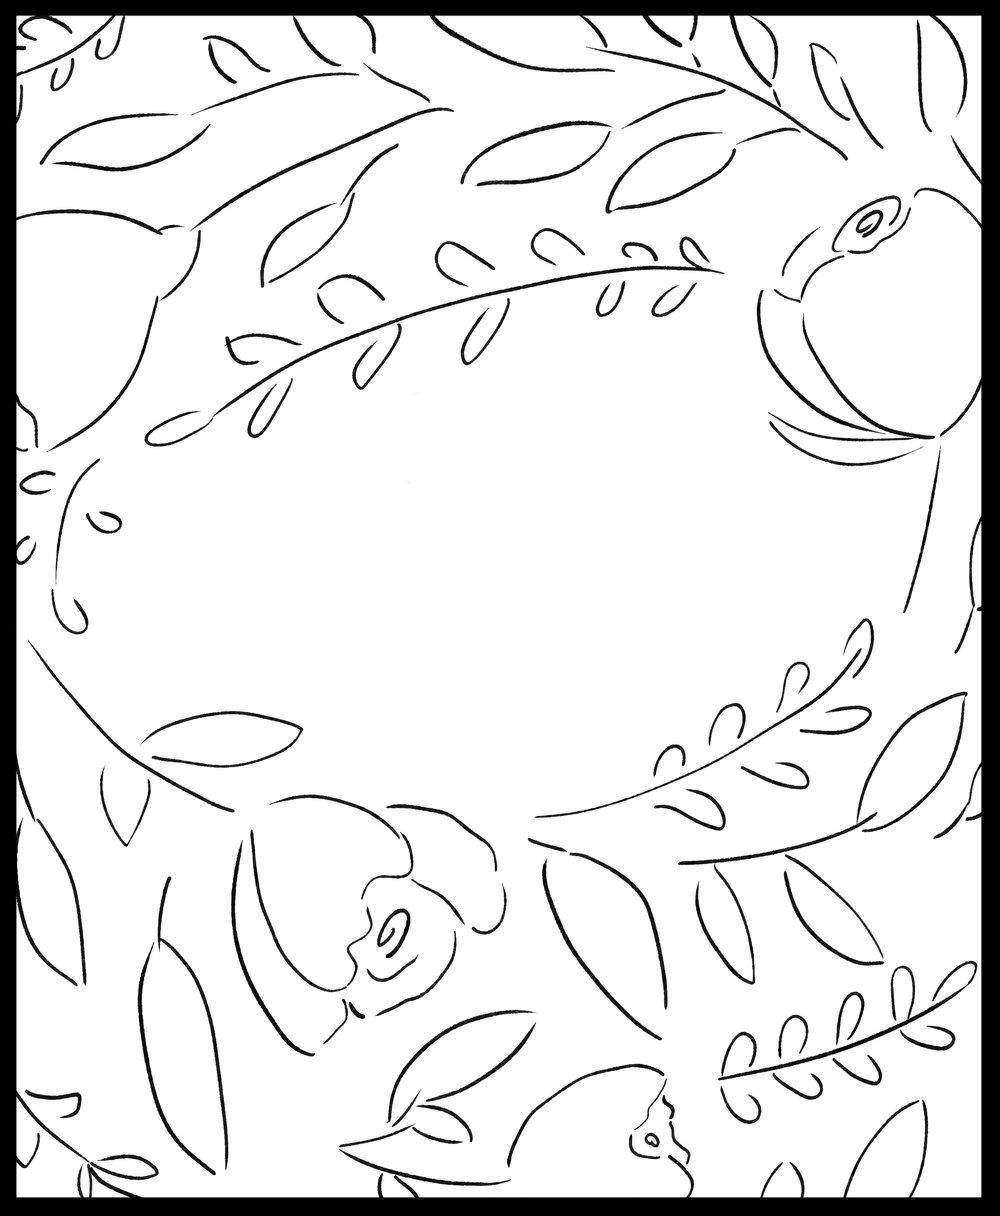 floral_wreath2.jpg